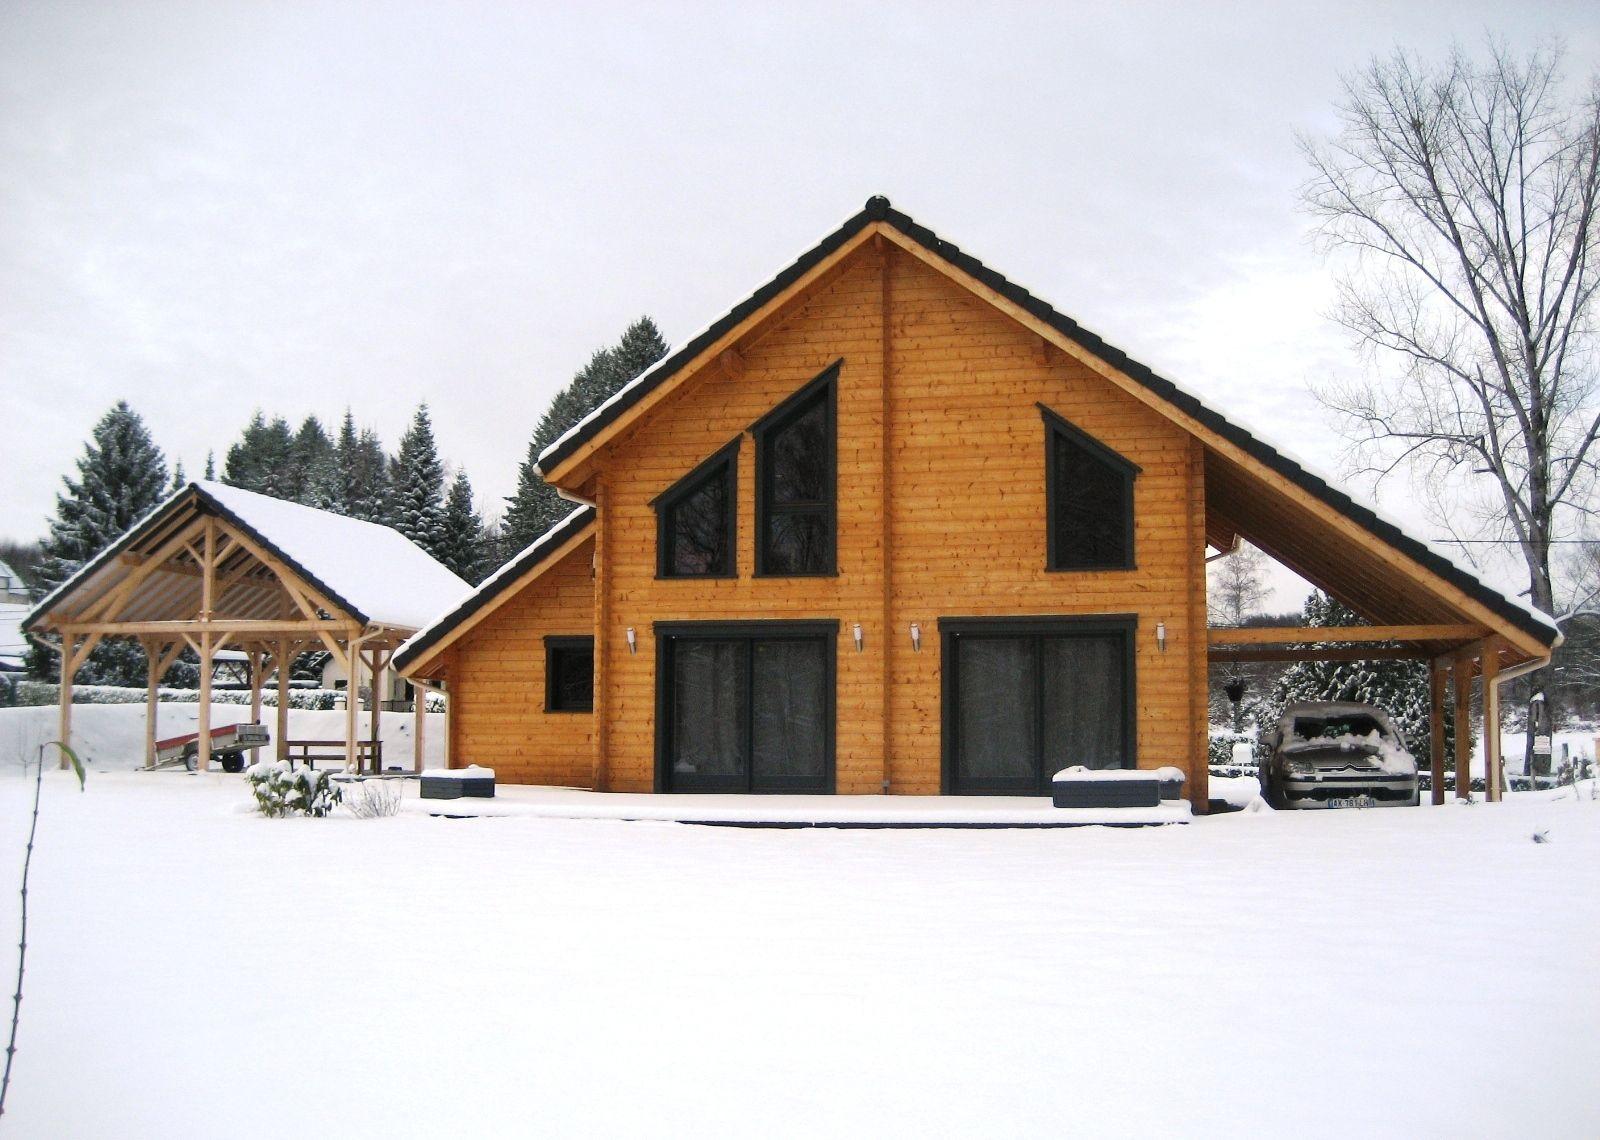 maison en kit maitriser son budget maison pinterest chalet maisons en bois et maison bois